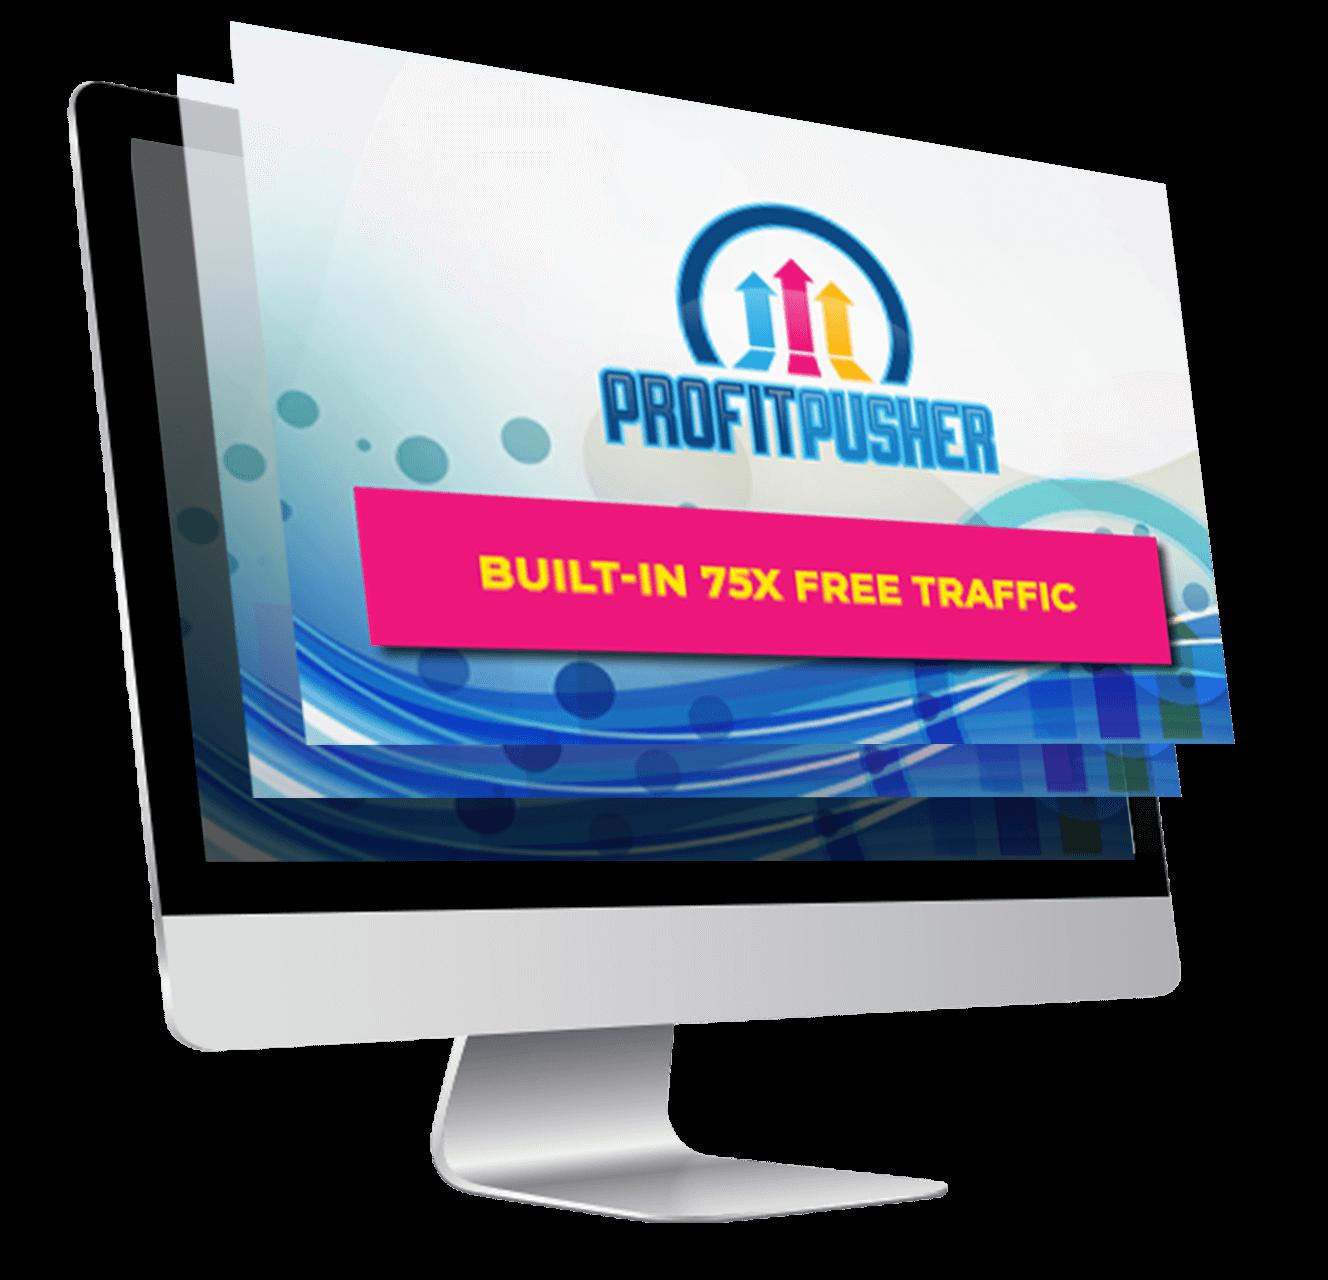 Profit-Pusher-feature-2